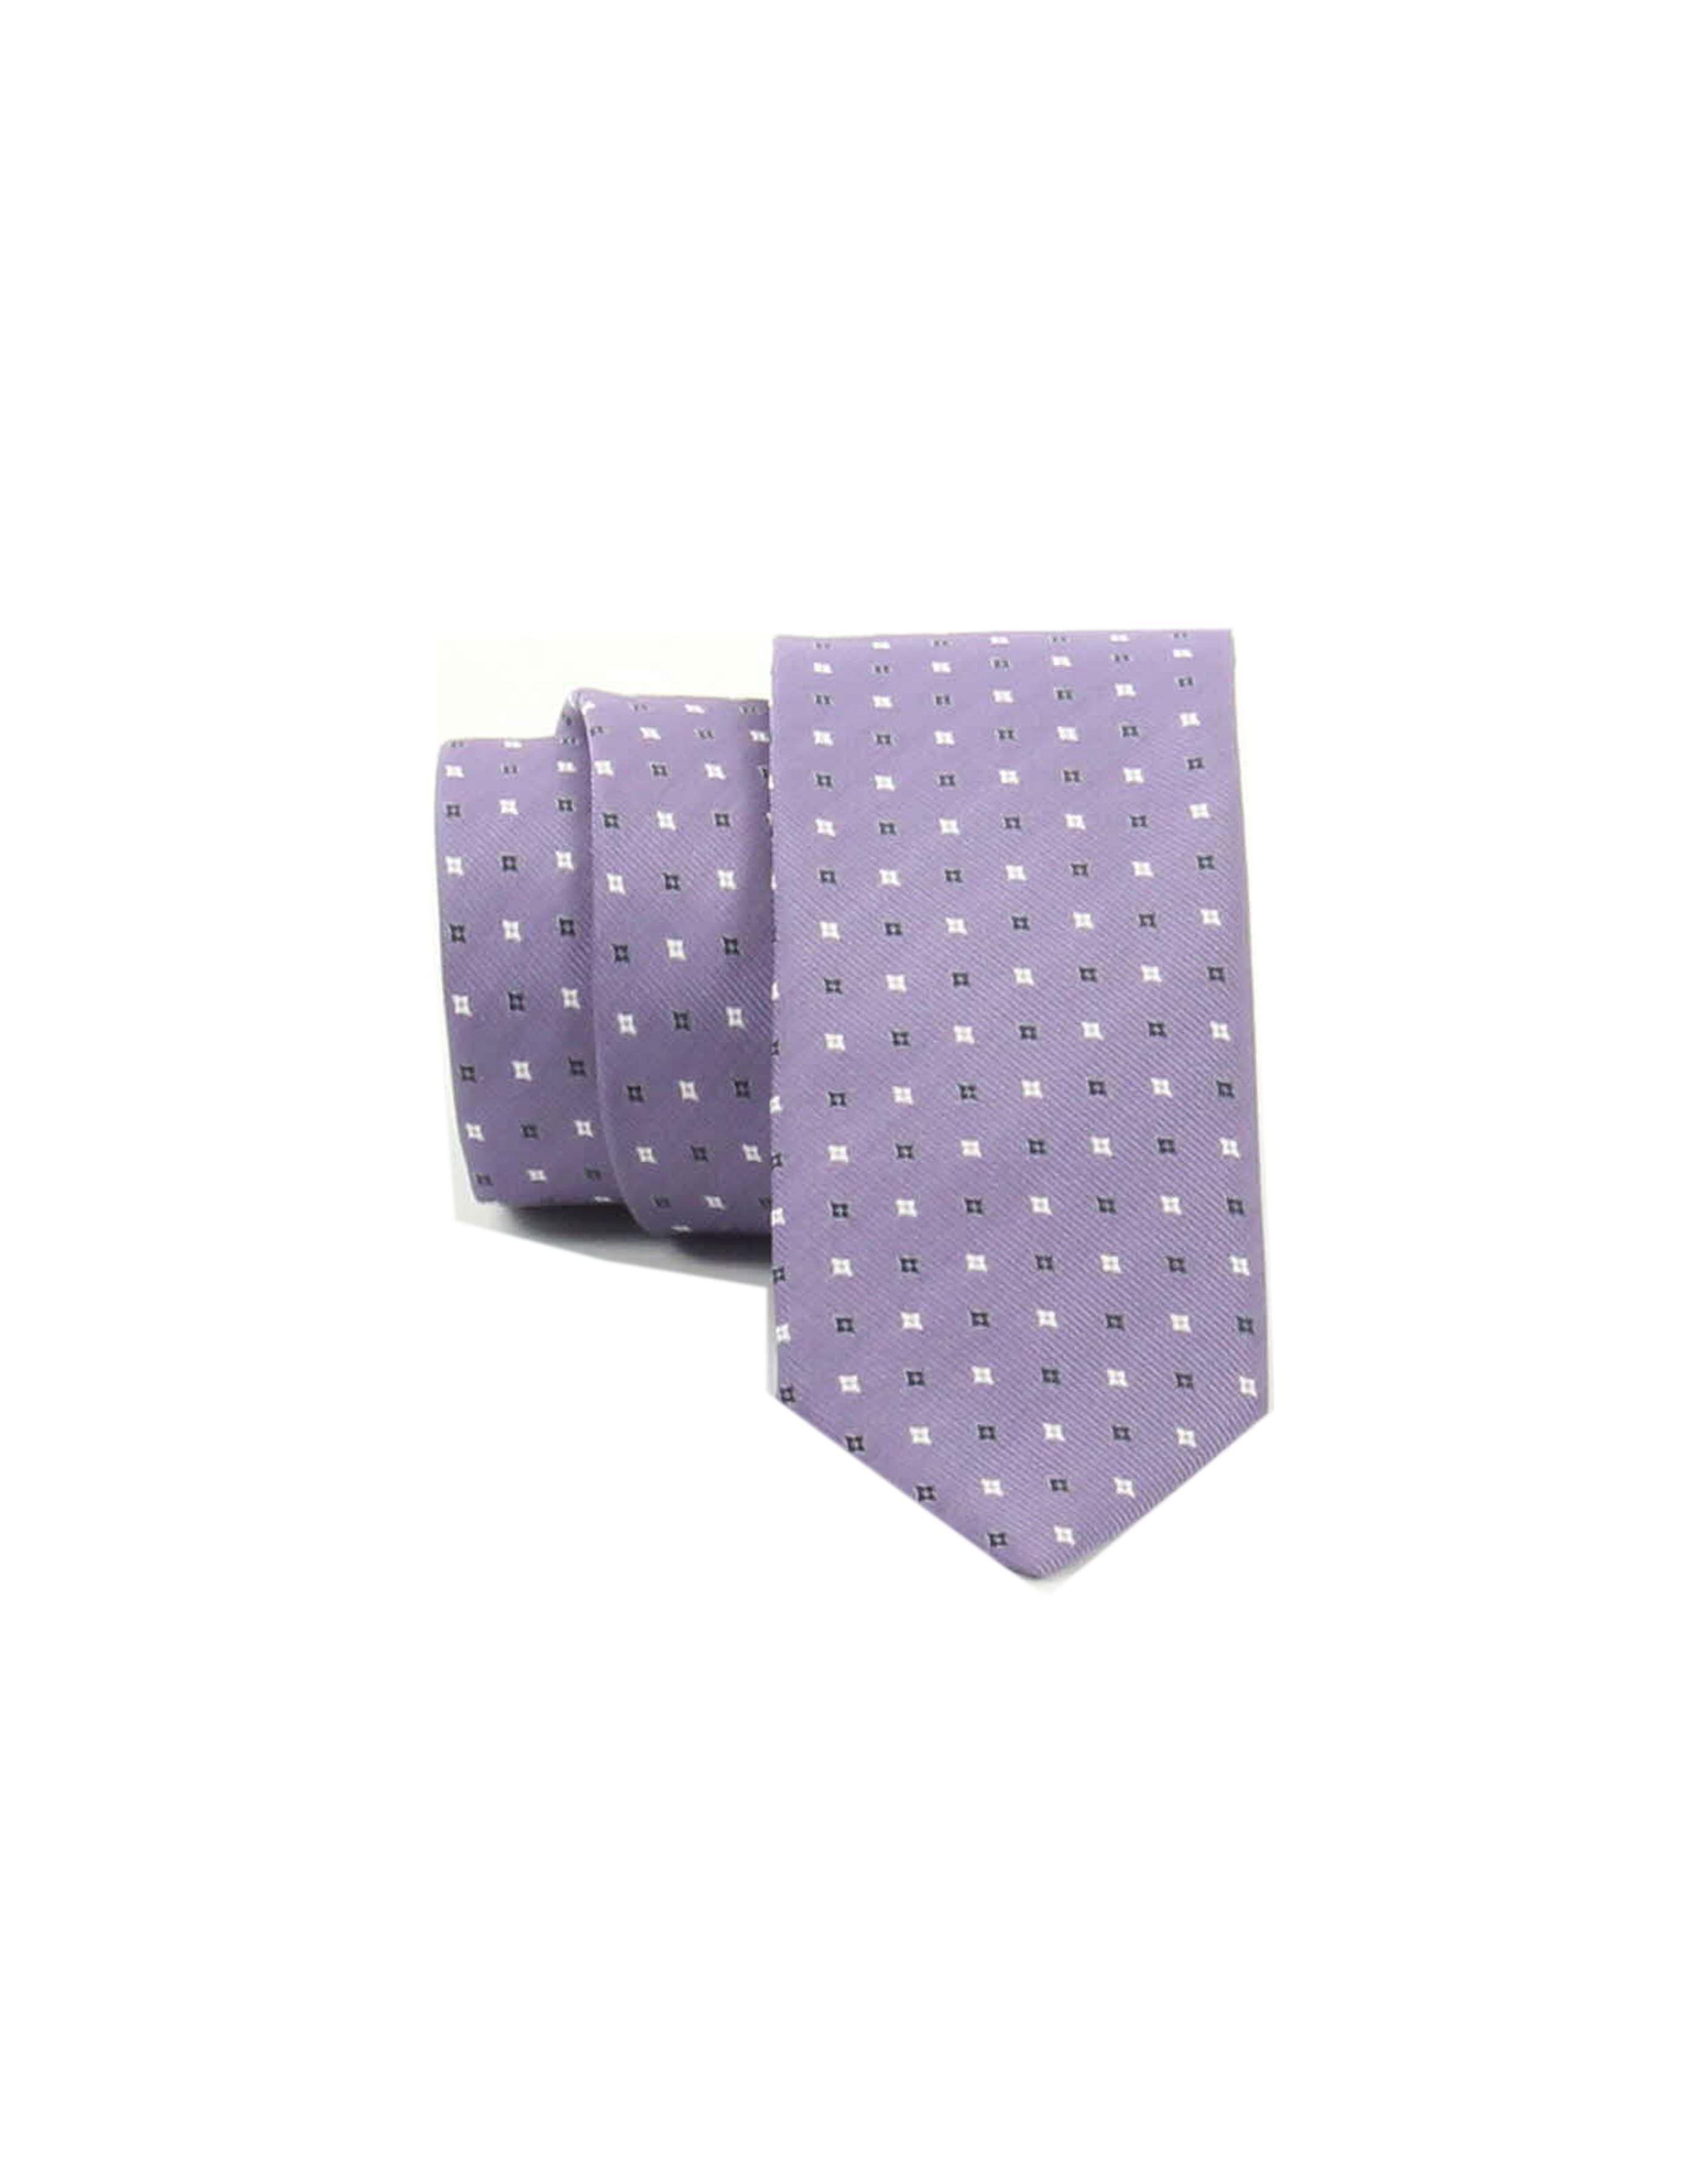 Cravate petits losanges